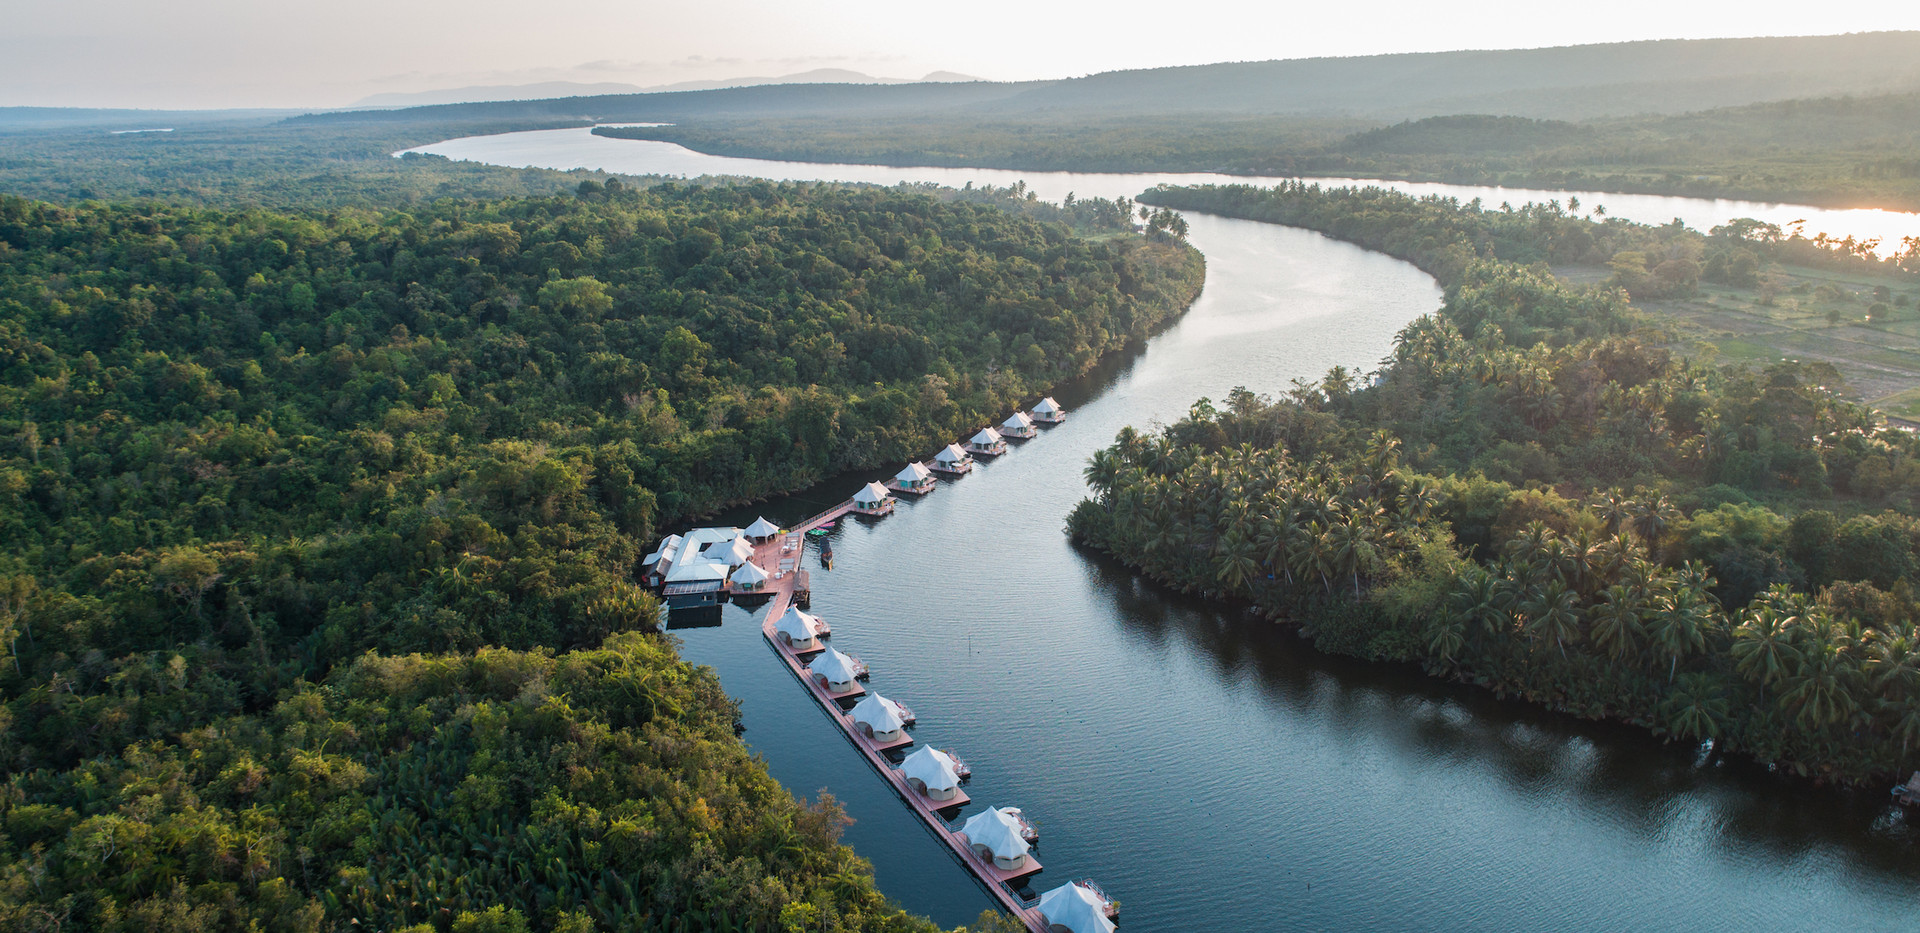 TYH_Destinations_River_Resort_3.jpgThailand Yoga Holidays Destination River Resort Topview